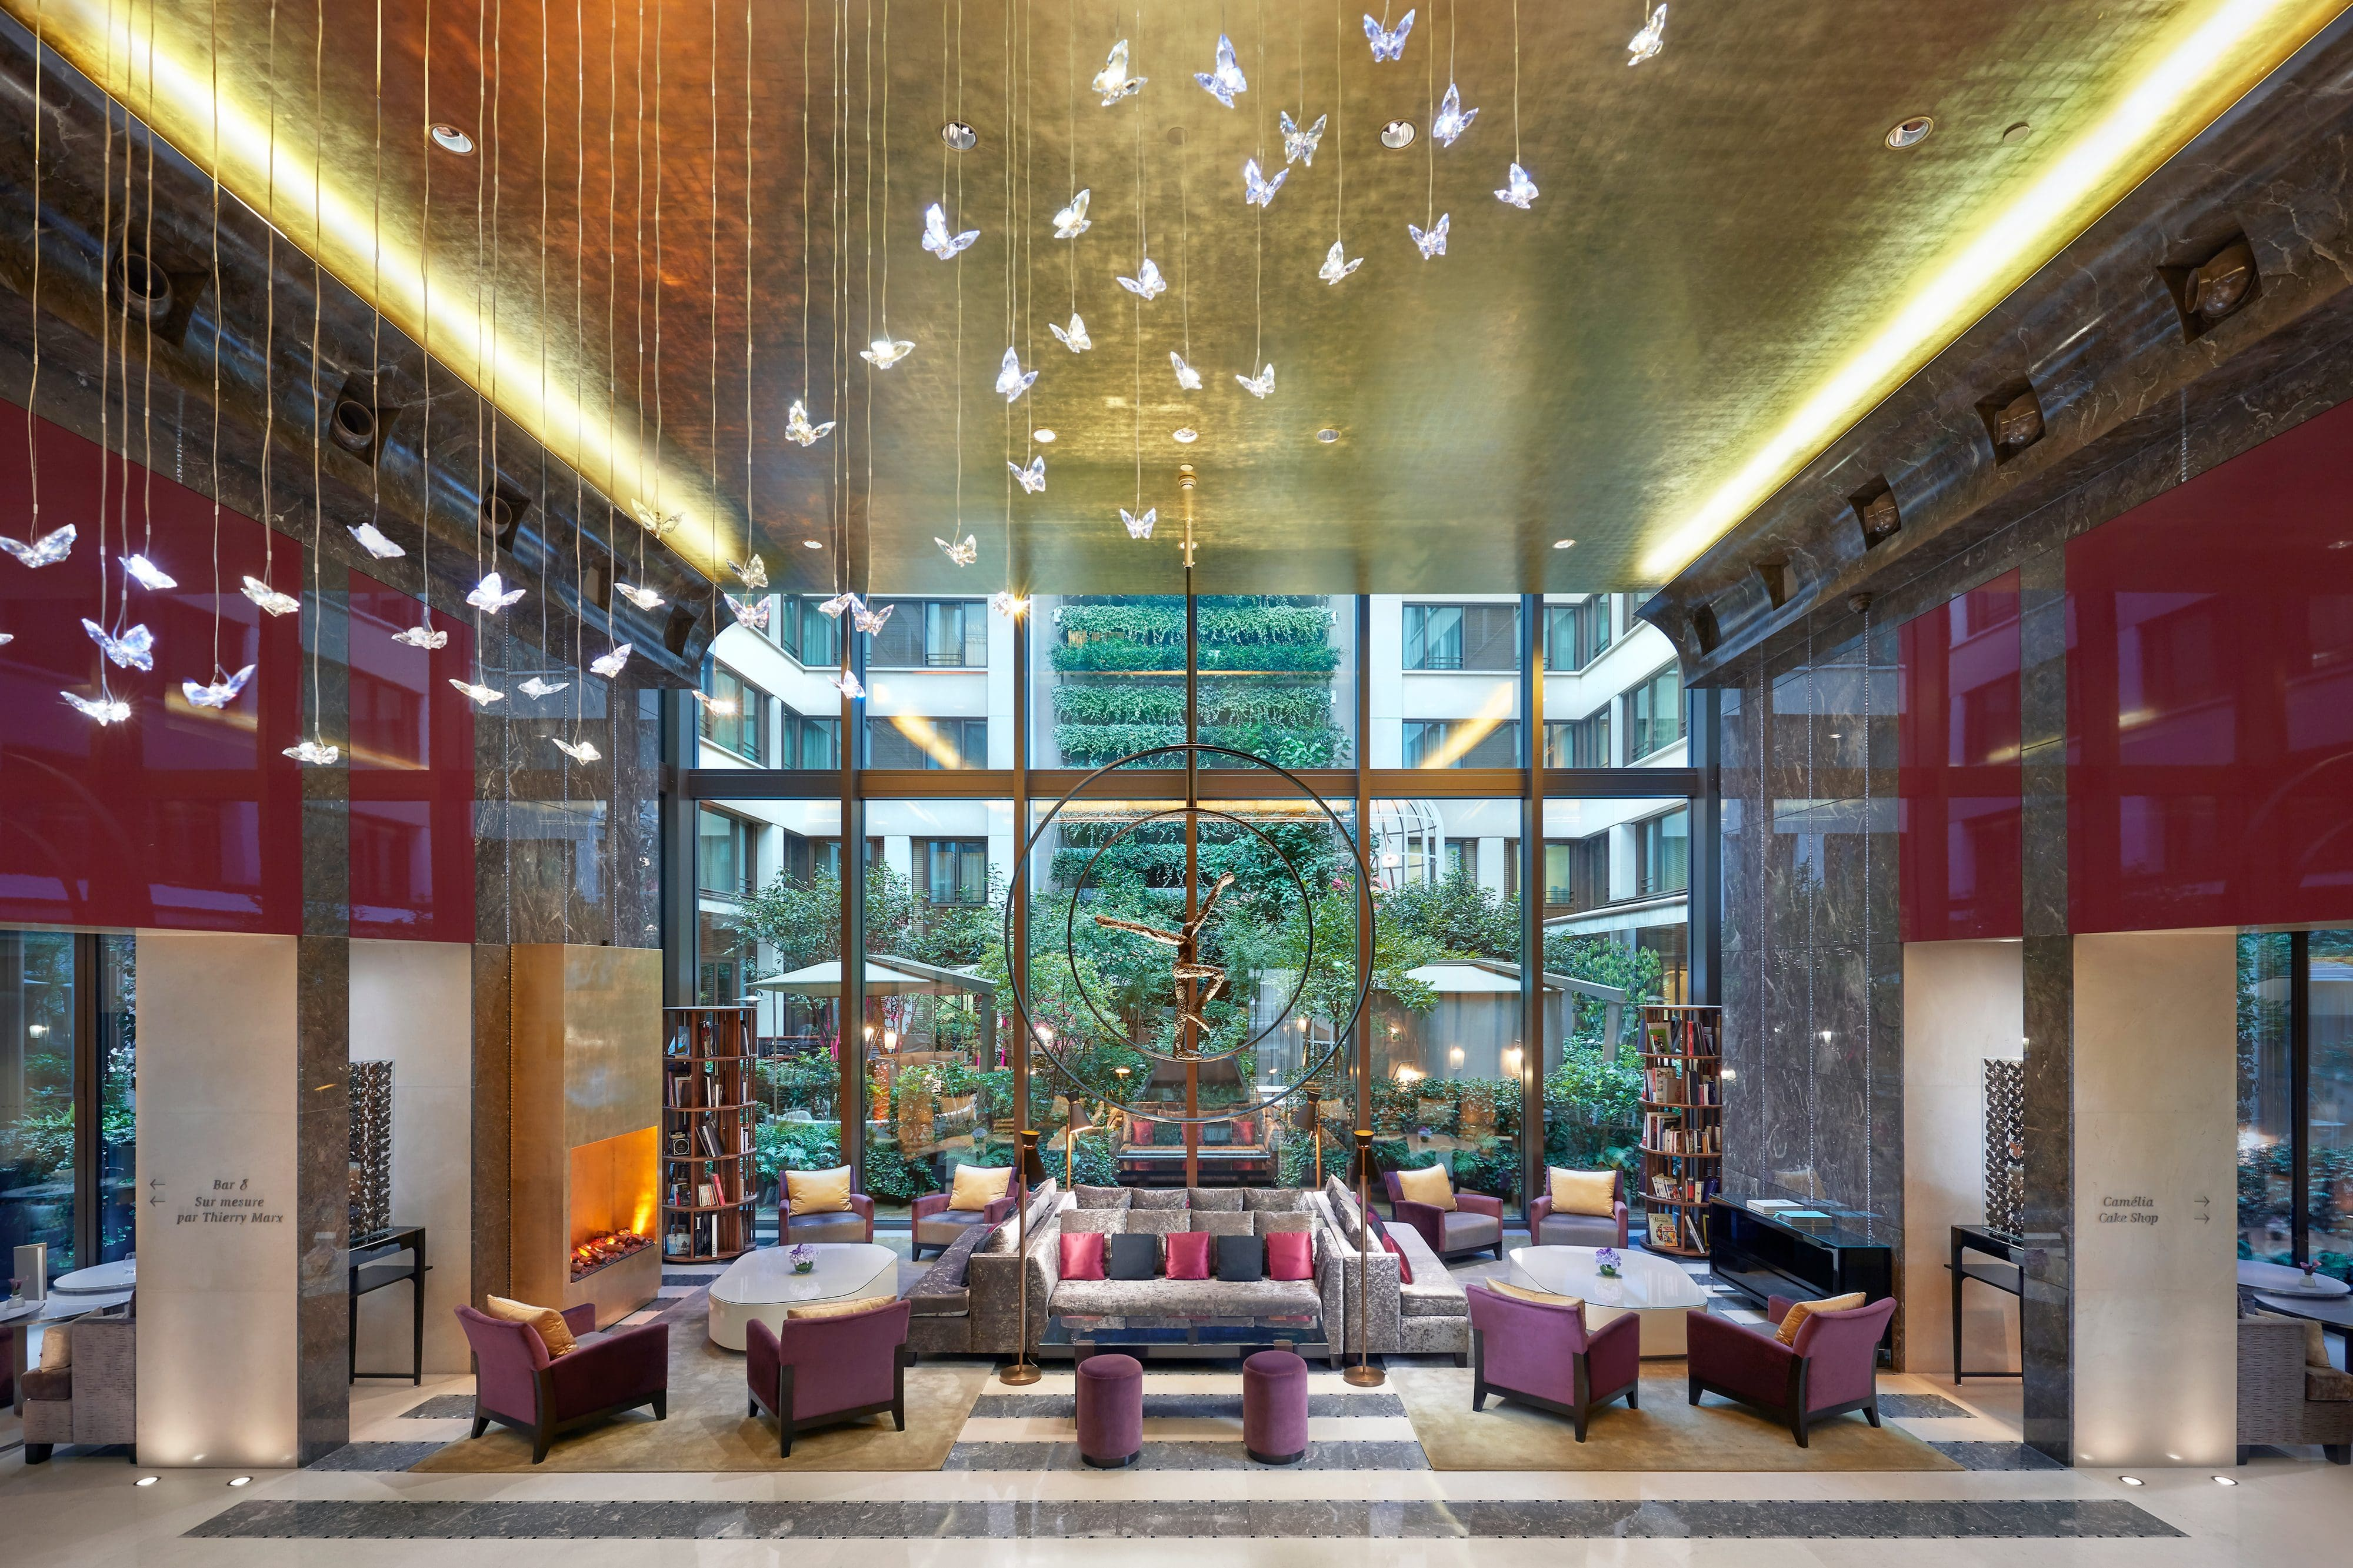 Lobby of Mandarin Oriental, Paris